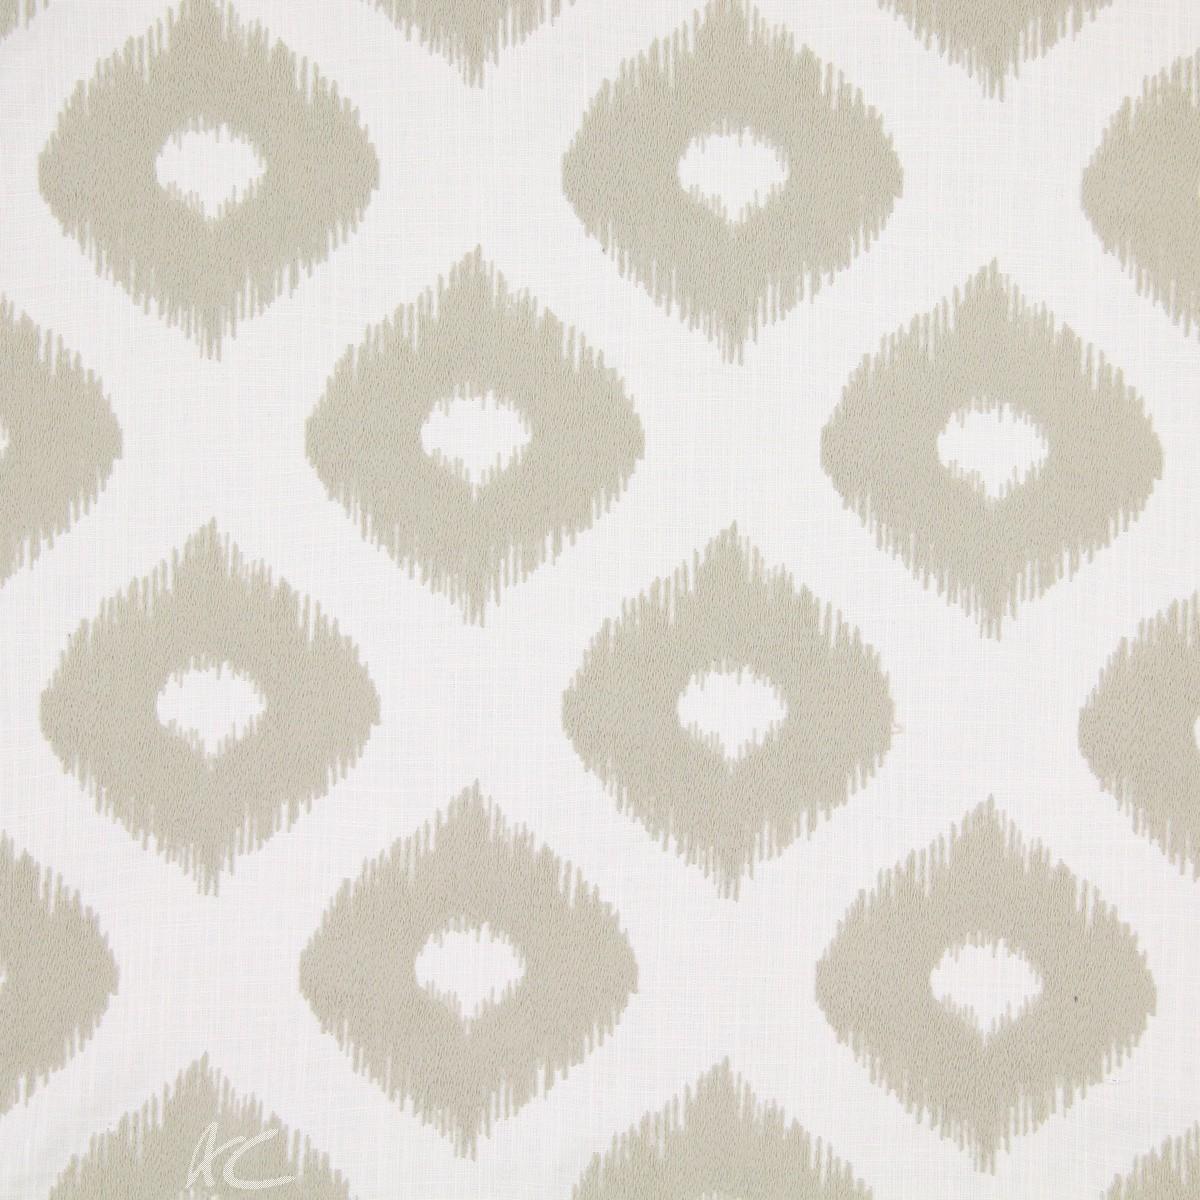 Indigo Austin Stone Cushion Covers